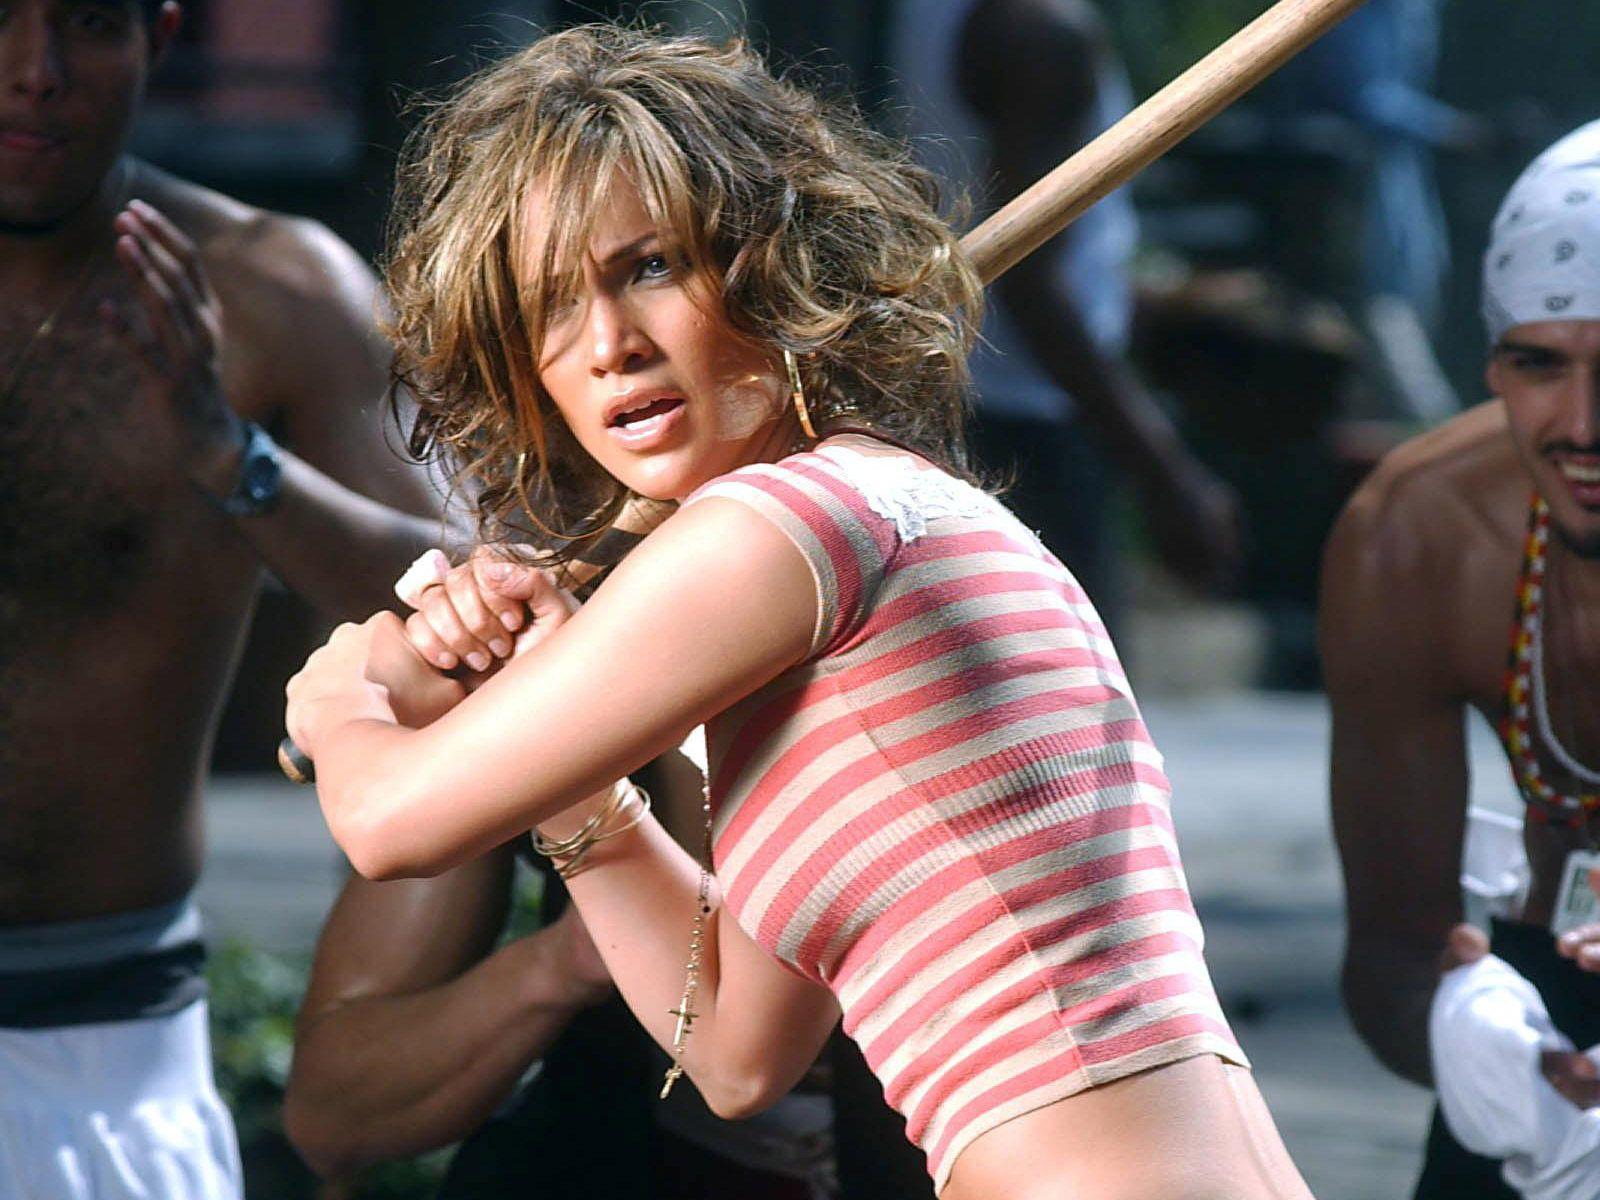 Jennifer Lopez Glamour Wallpaper very high quality desktop wallpapers 1600x1200